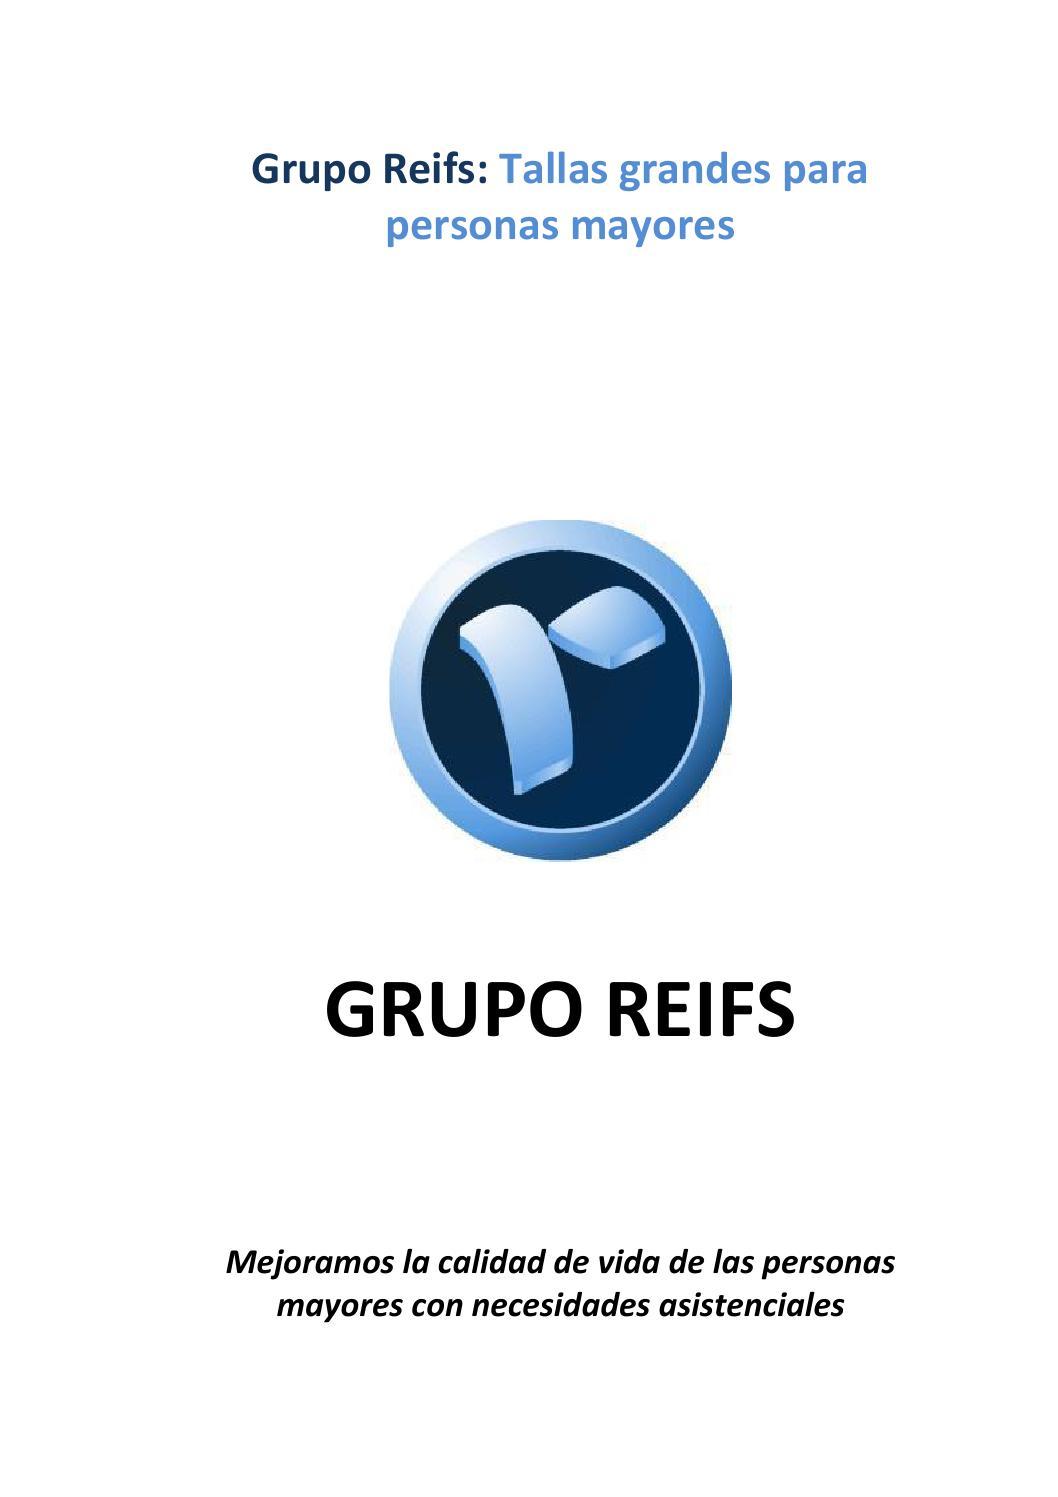 Grupo Reifs Tallas Grandes Para Personas Mayores By Grupo Reifs Issuu